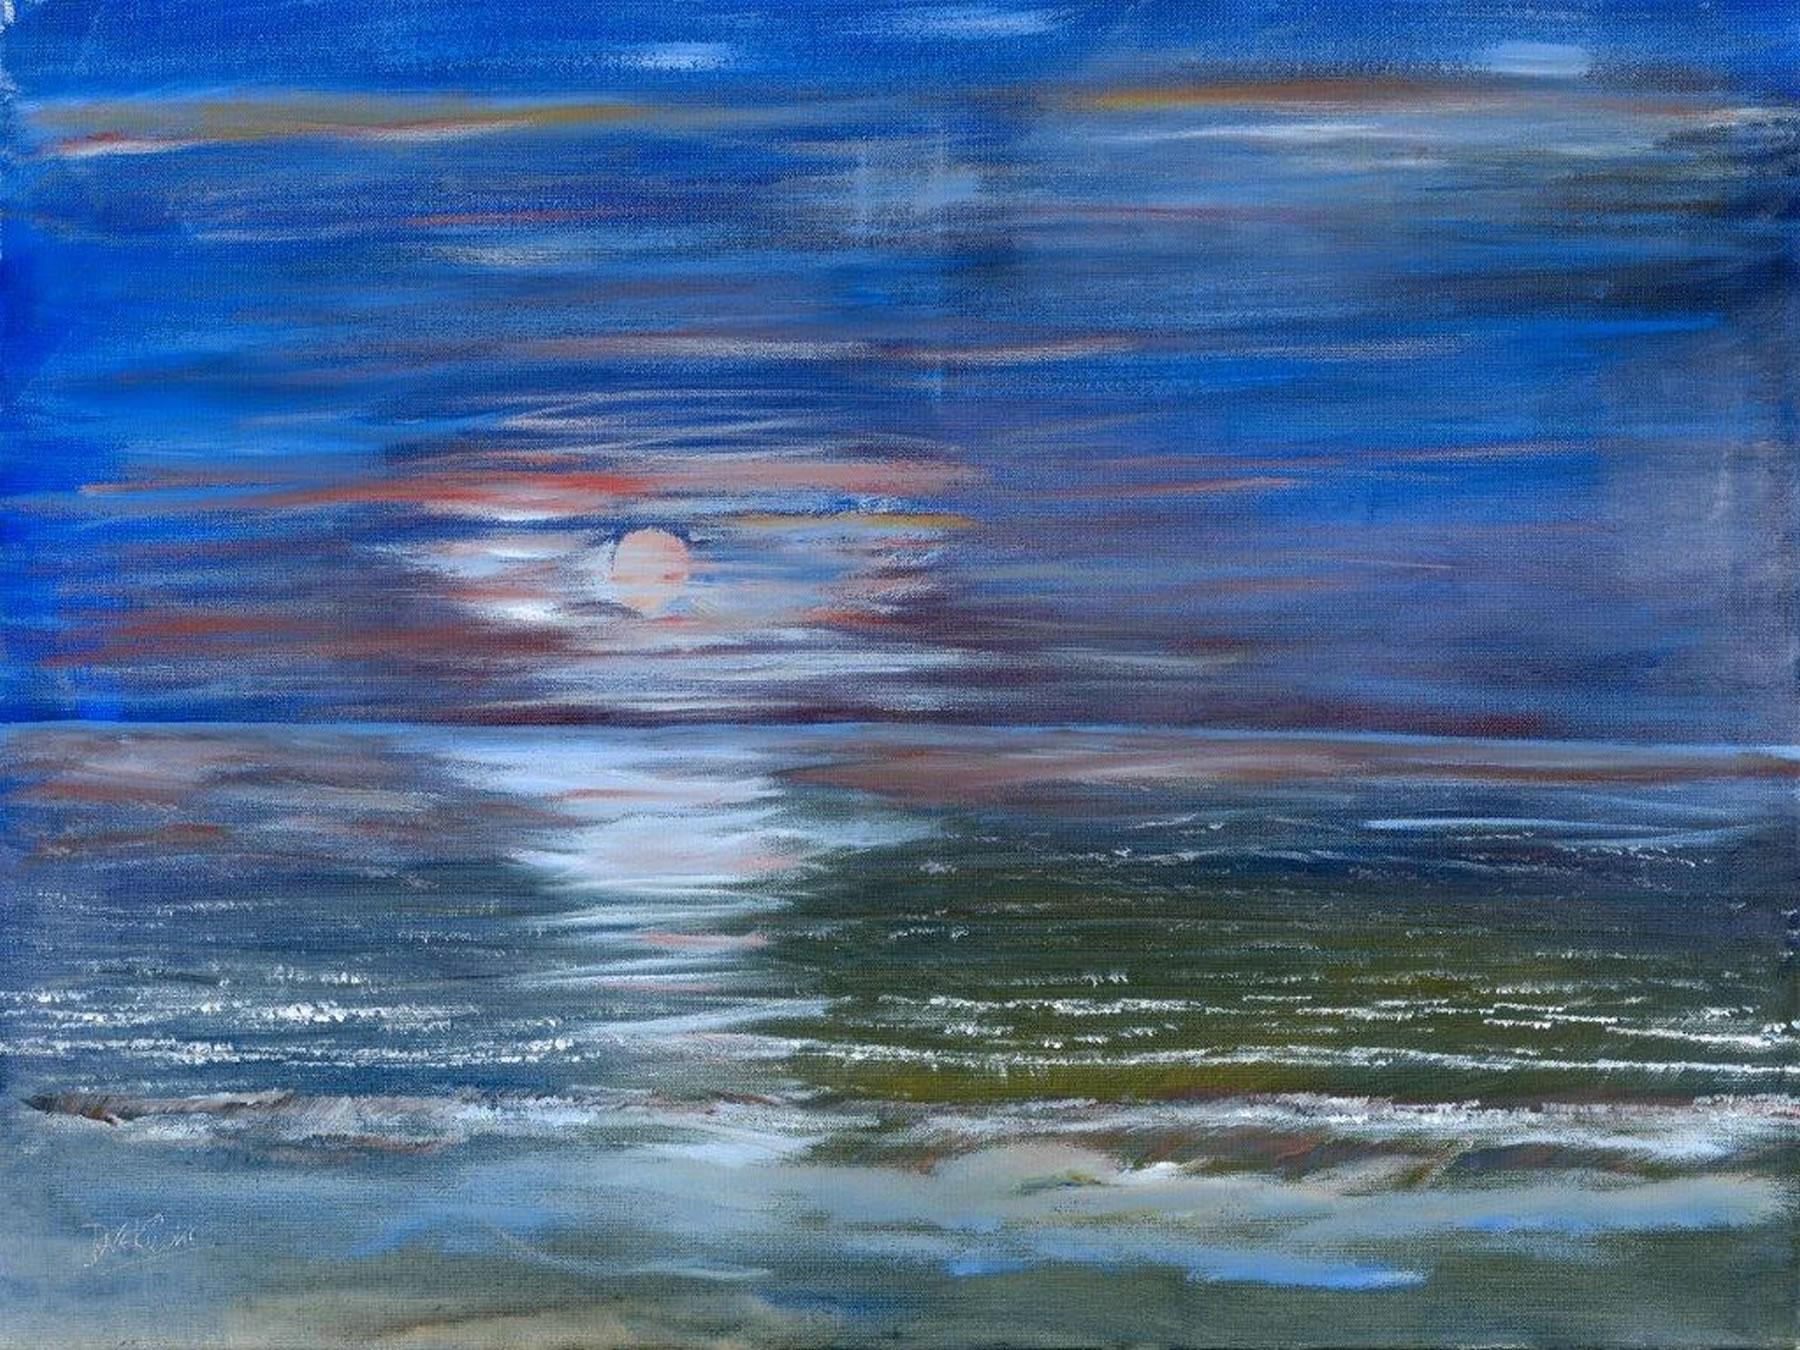 Moonlight Magic - Art Prints - Sea and sky at night painting